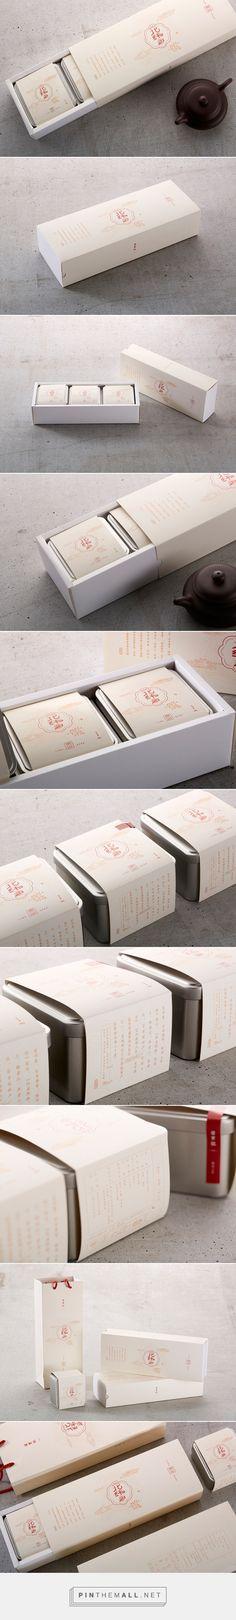 北纬三十度 / tea packaging by Yuho Studio